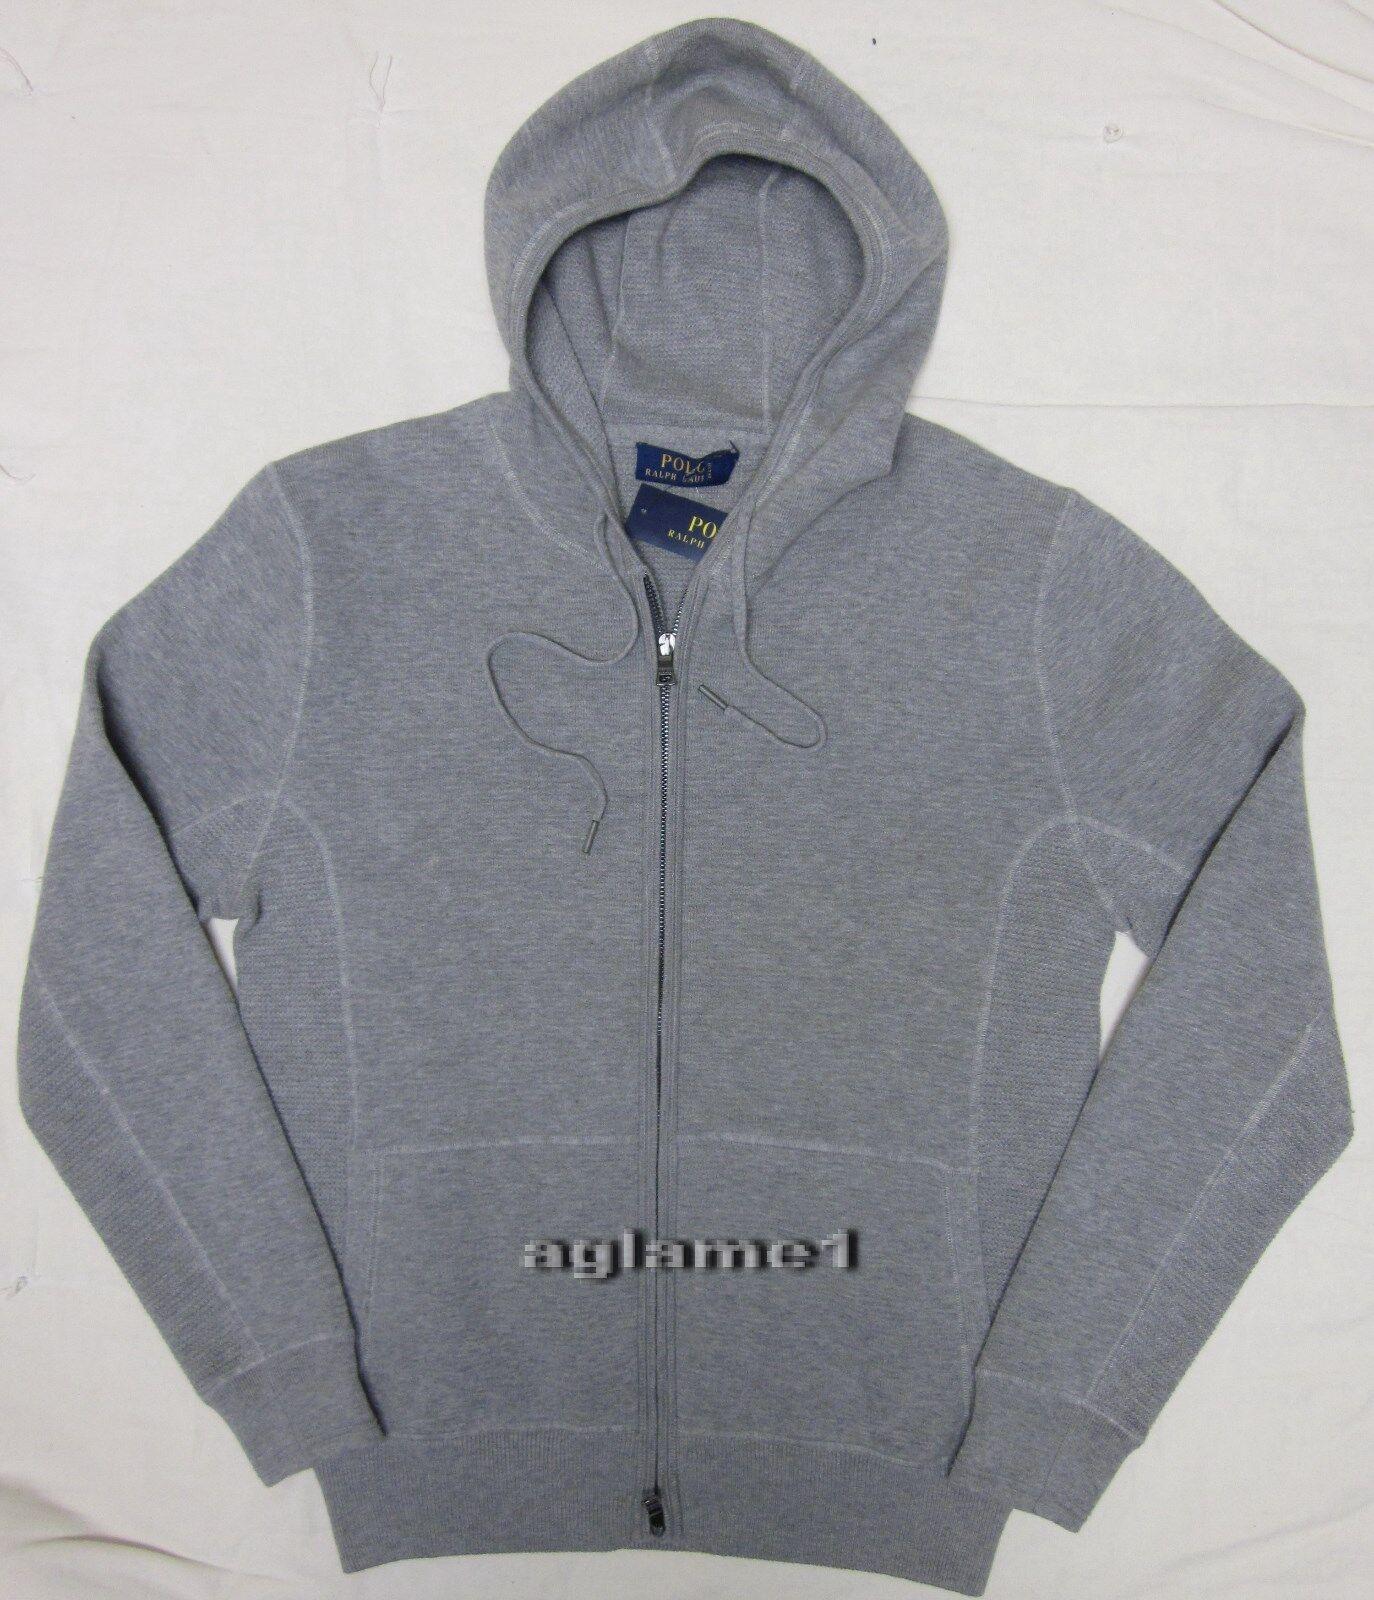 Polo Ralph Lauren cashmere cotton blend Hoodie hood Sweater cardigan L